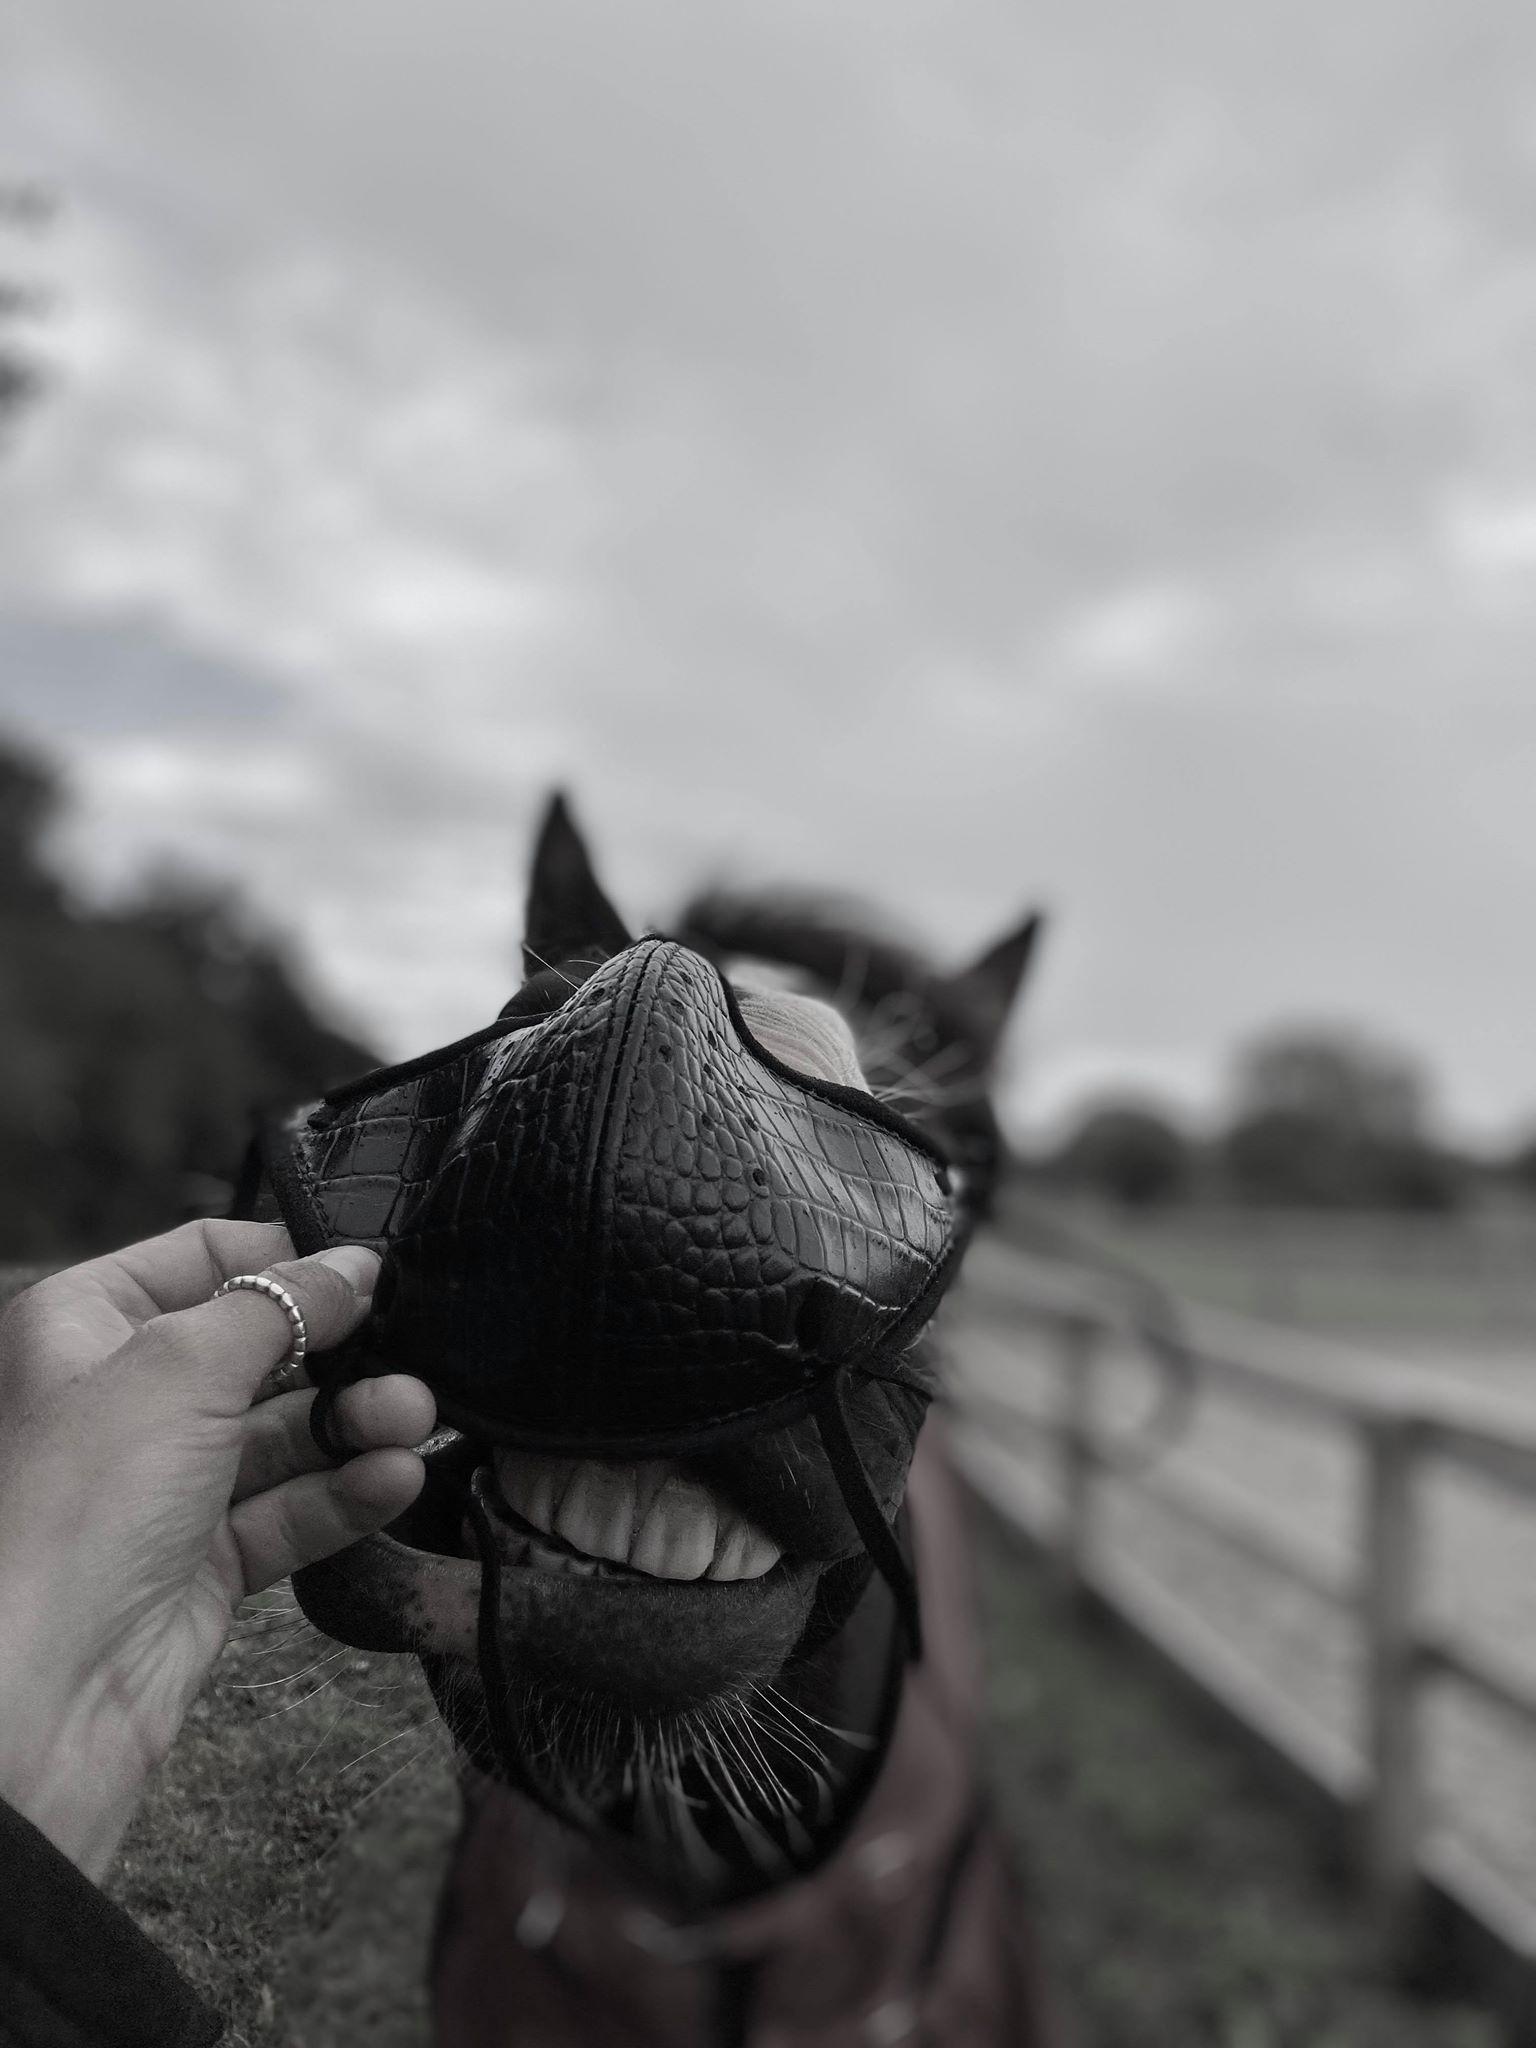 horse wearing mask